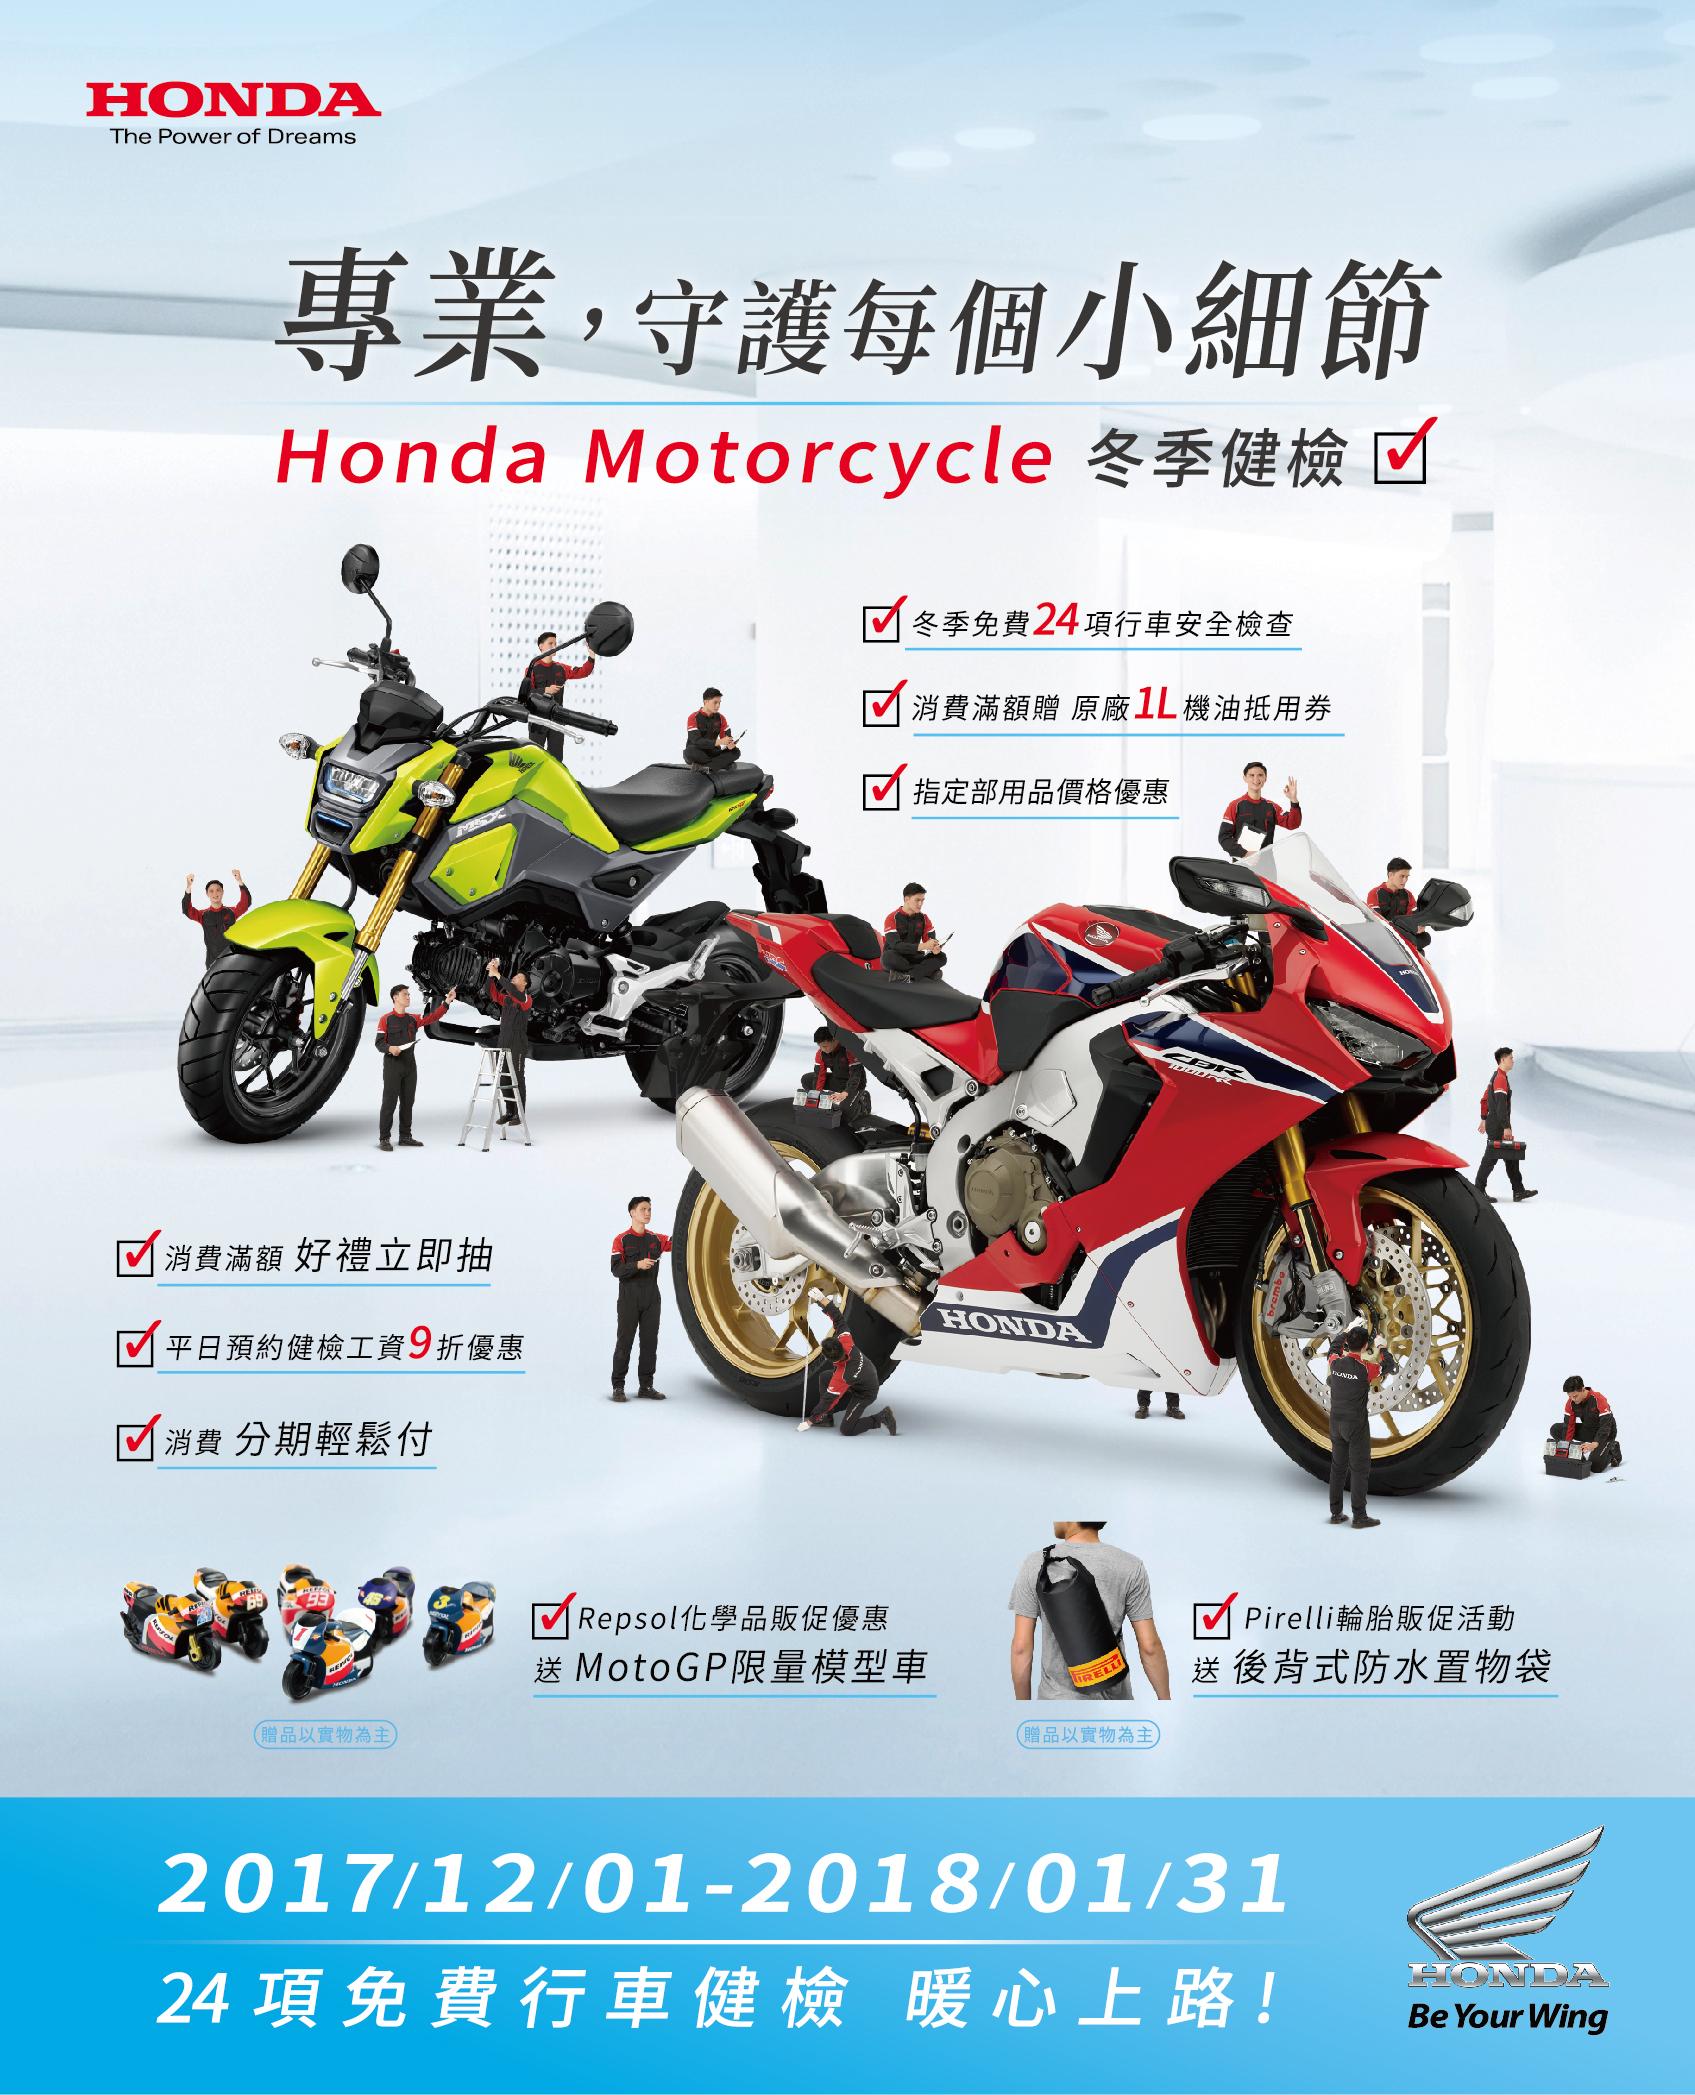 Honda Motorcycle 冬季服務活動 專業 守護每個小細節.jpg